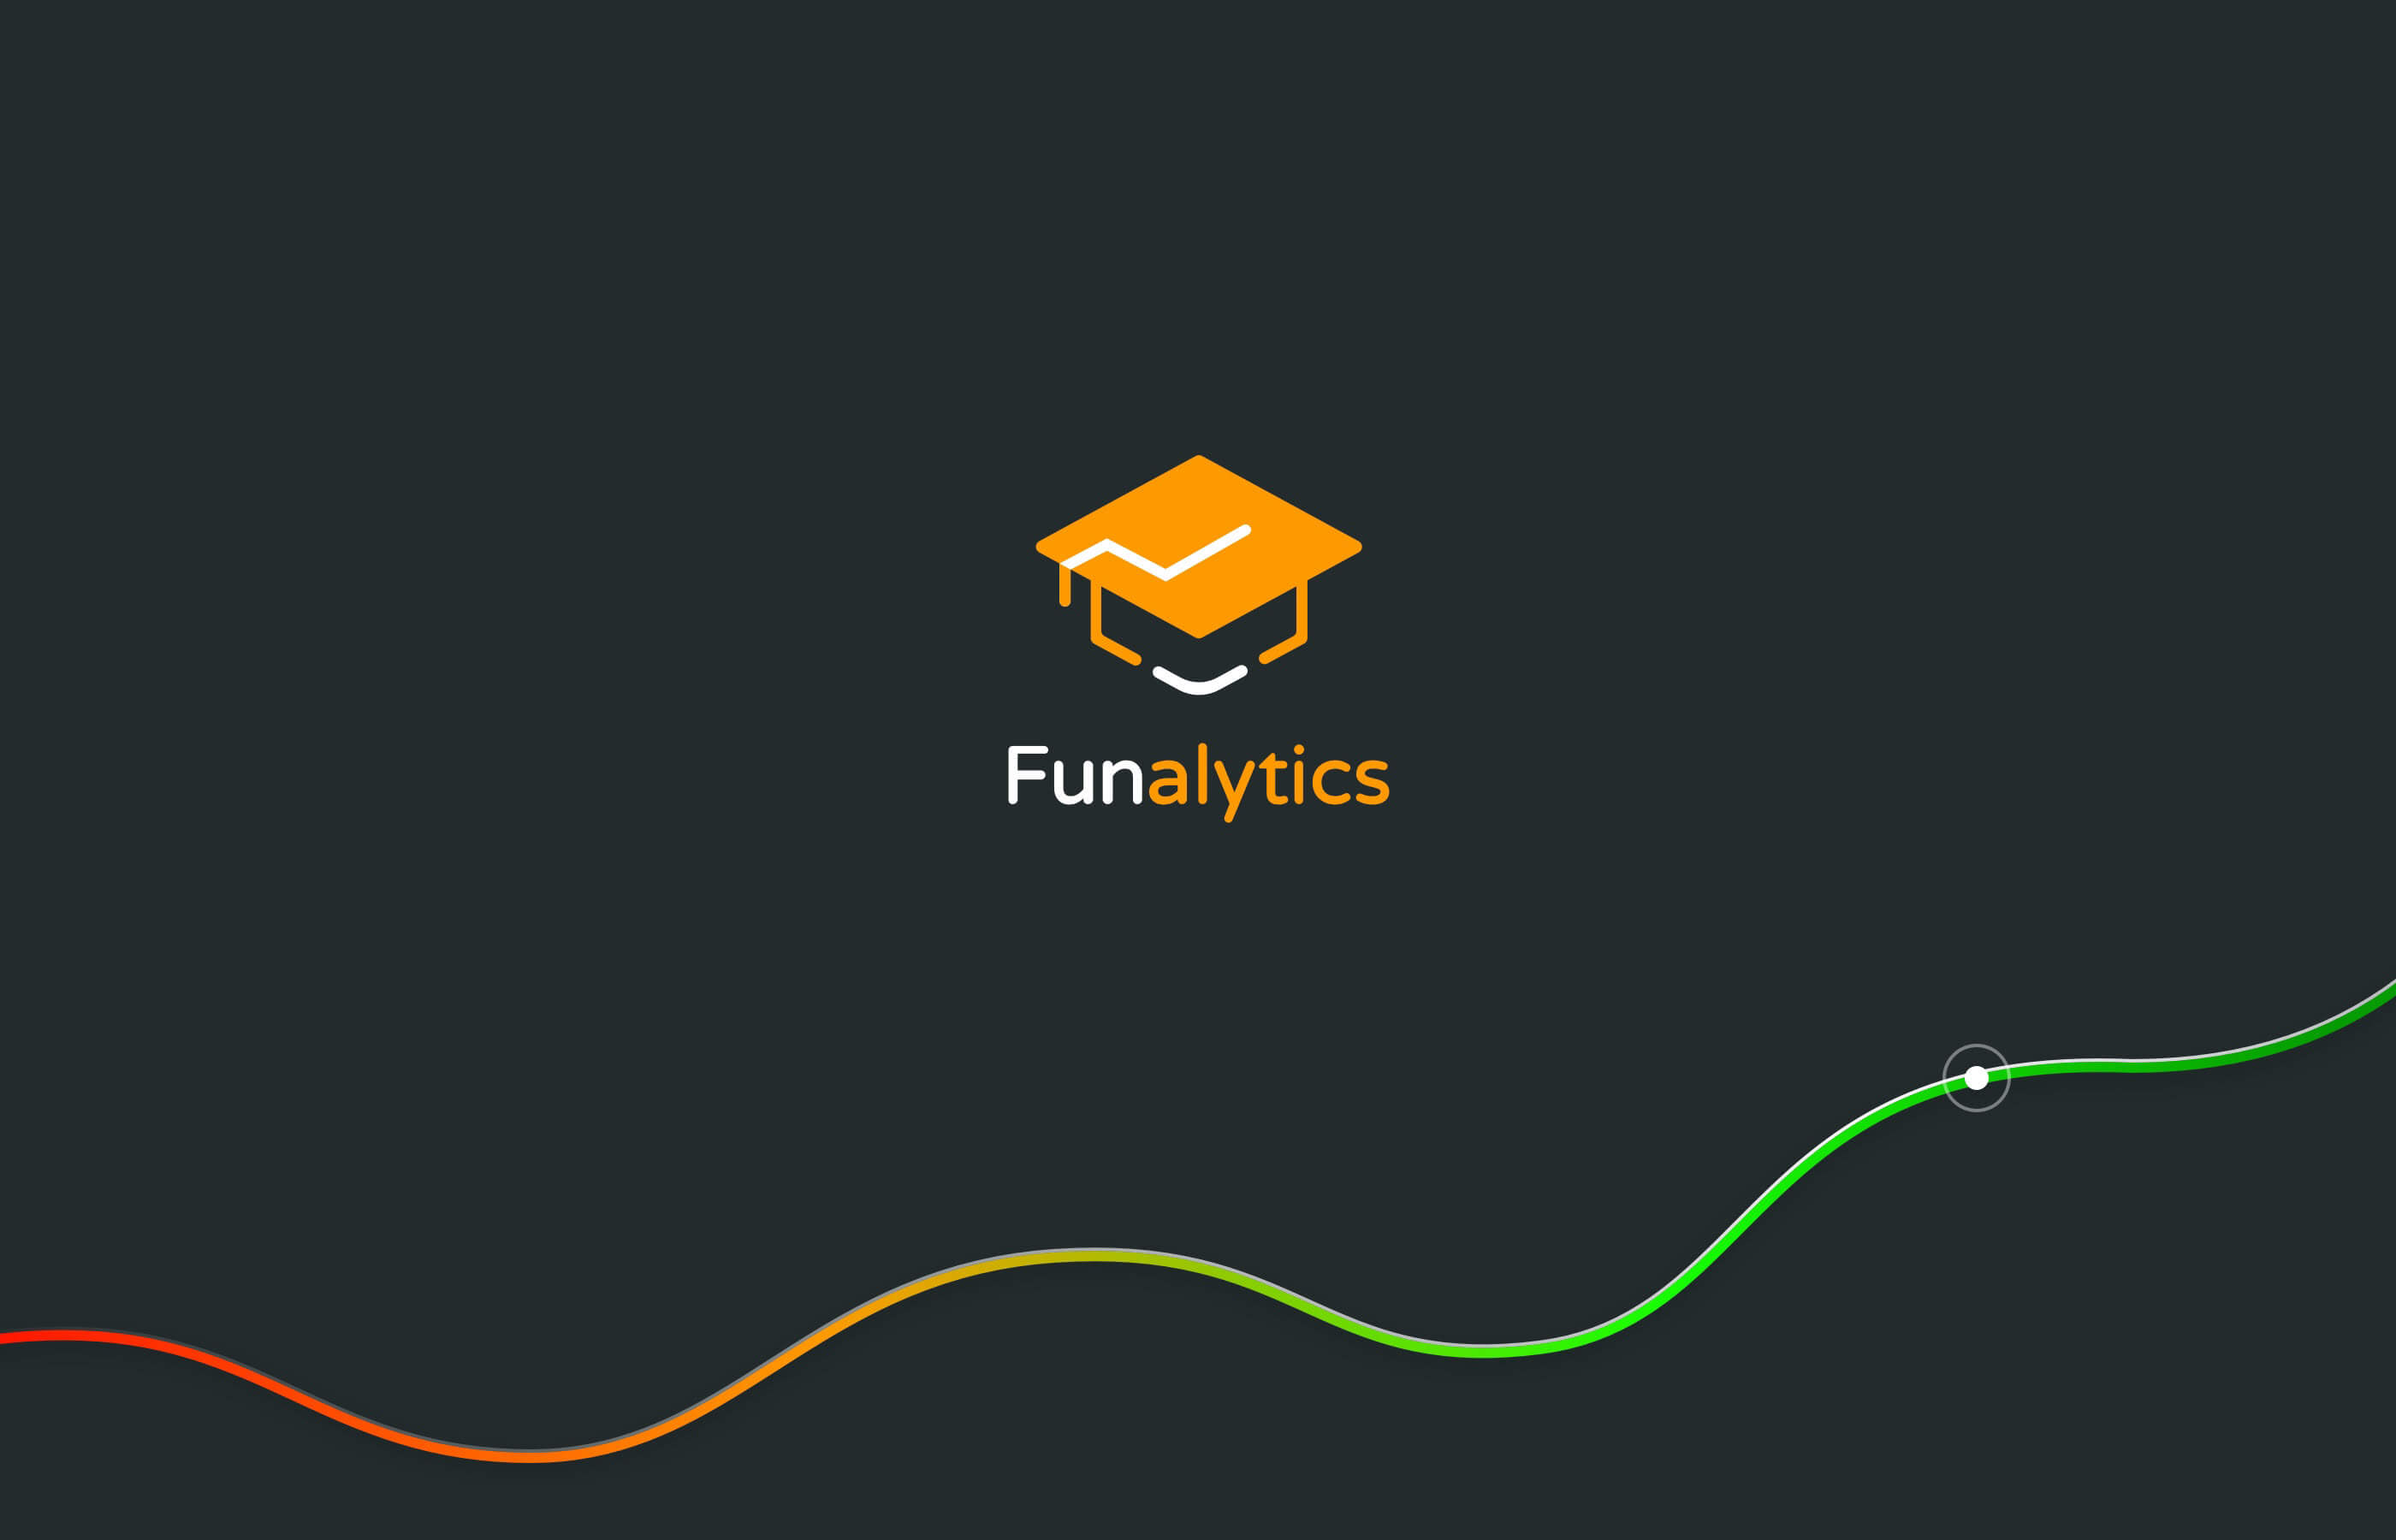 Funalytics